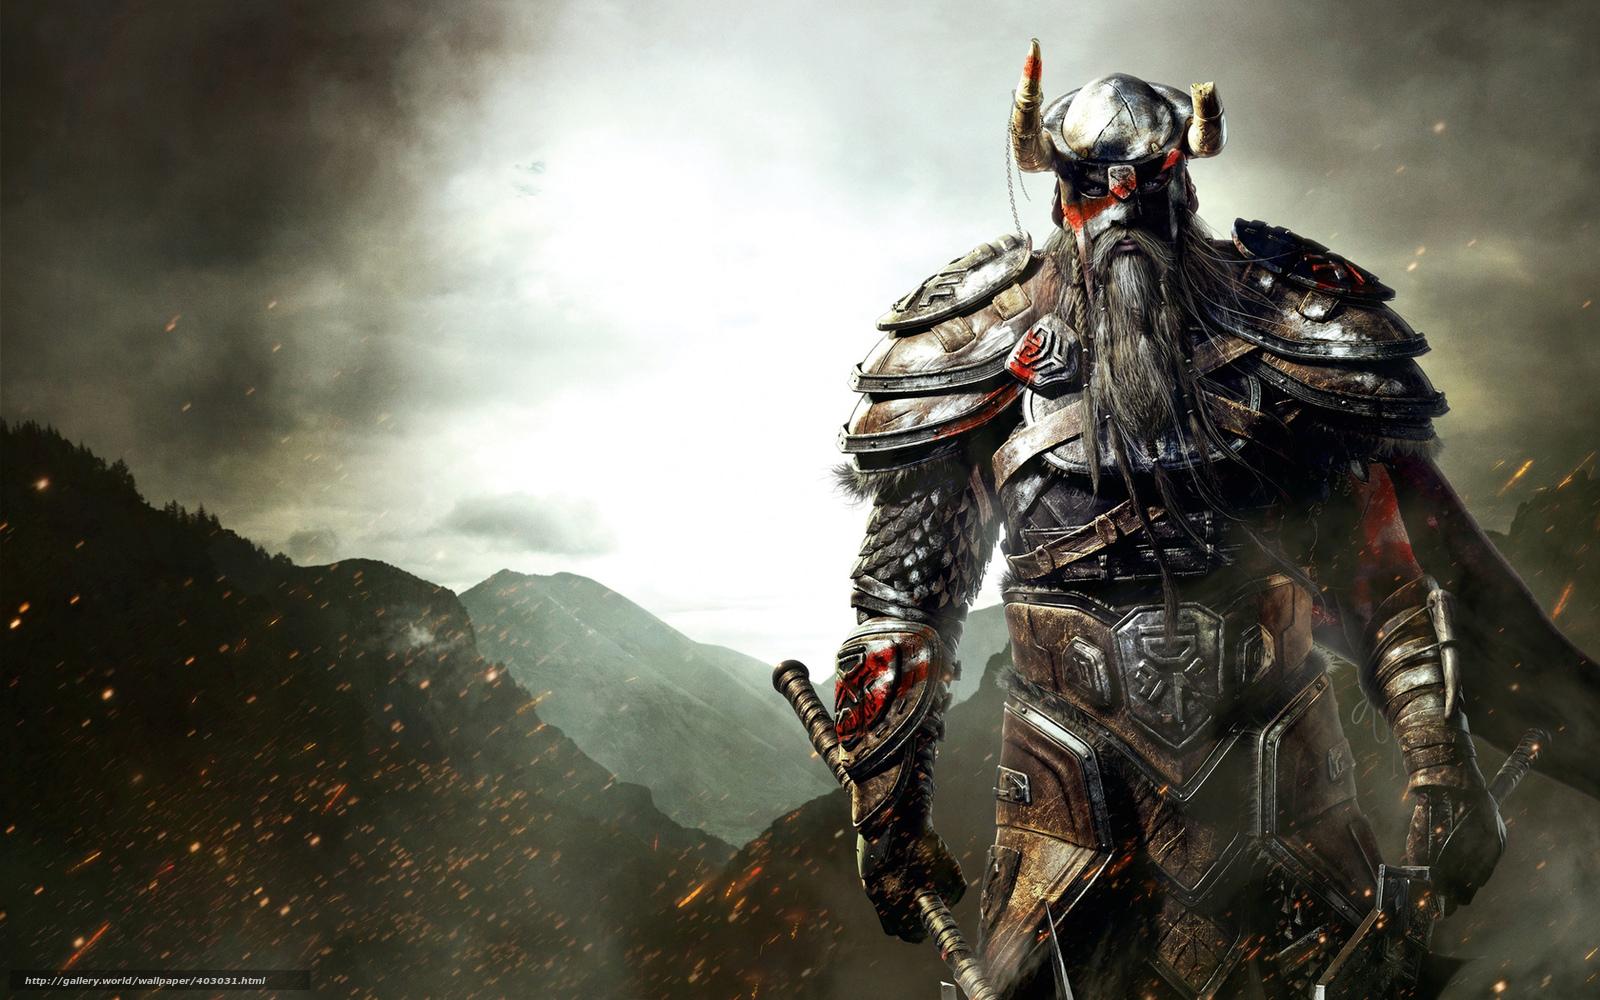 Download wallpaper viking armor sword ax desktop wallpaper in 1600x1000